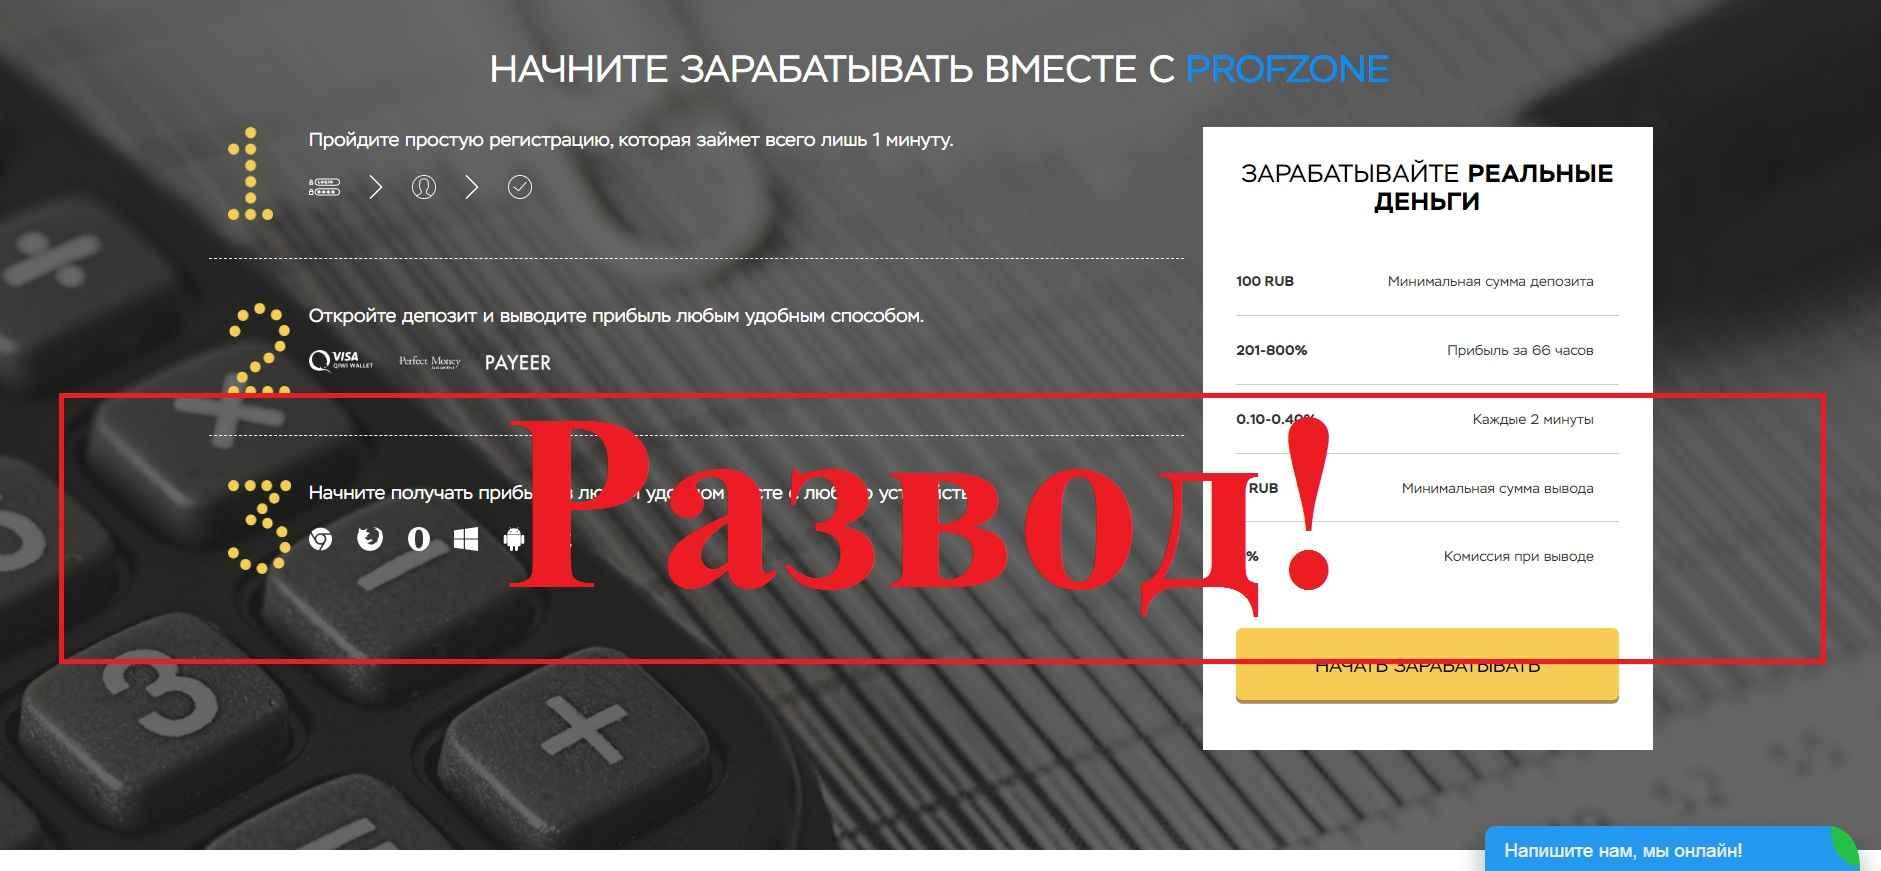 ProfZone (profzone.trade): инвестиции в стартапы